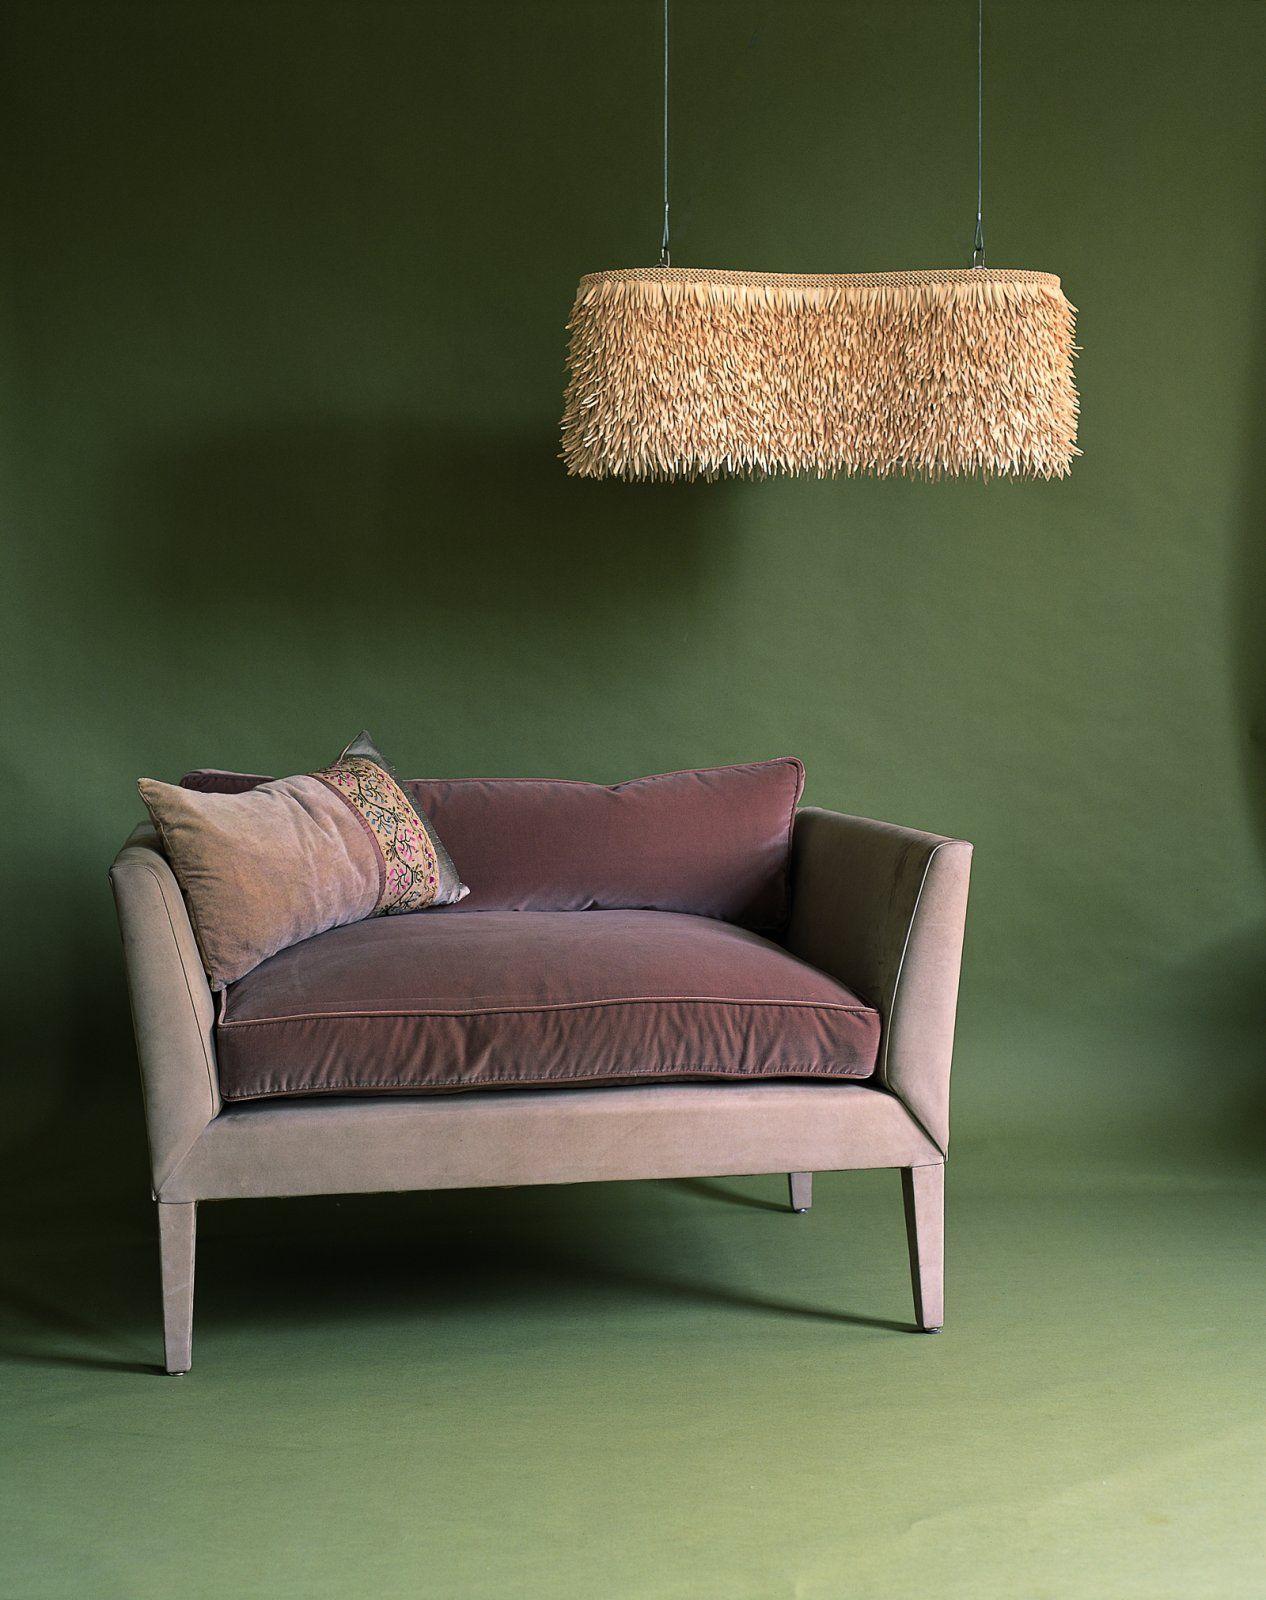 OCHRE   Contemporary Furniture, Lighting And Accessory Design   Coco    Pendant Light Ochre.